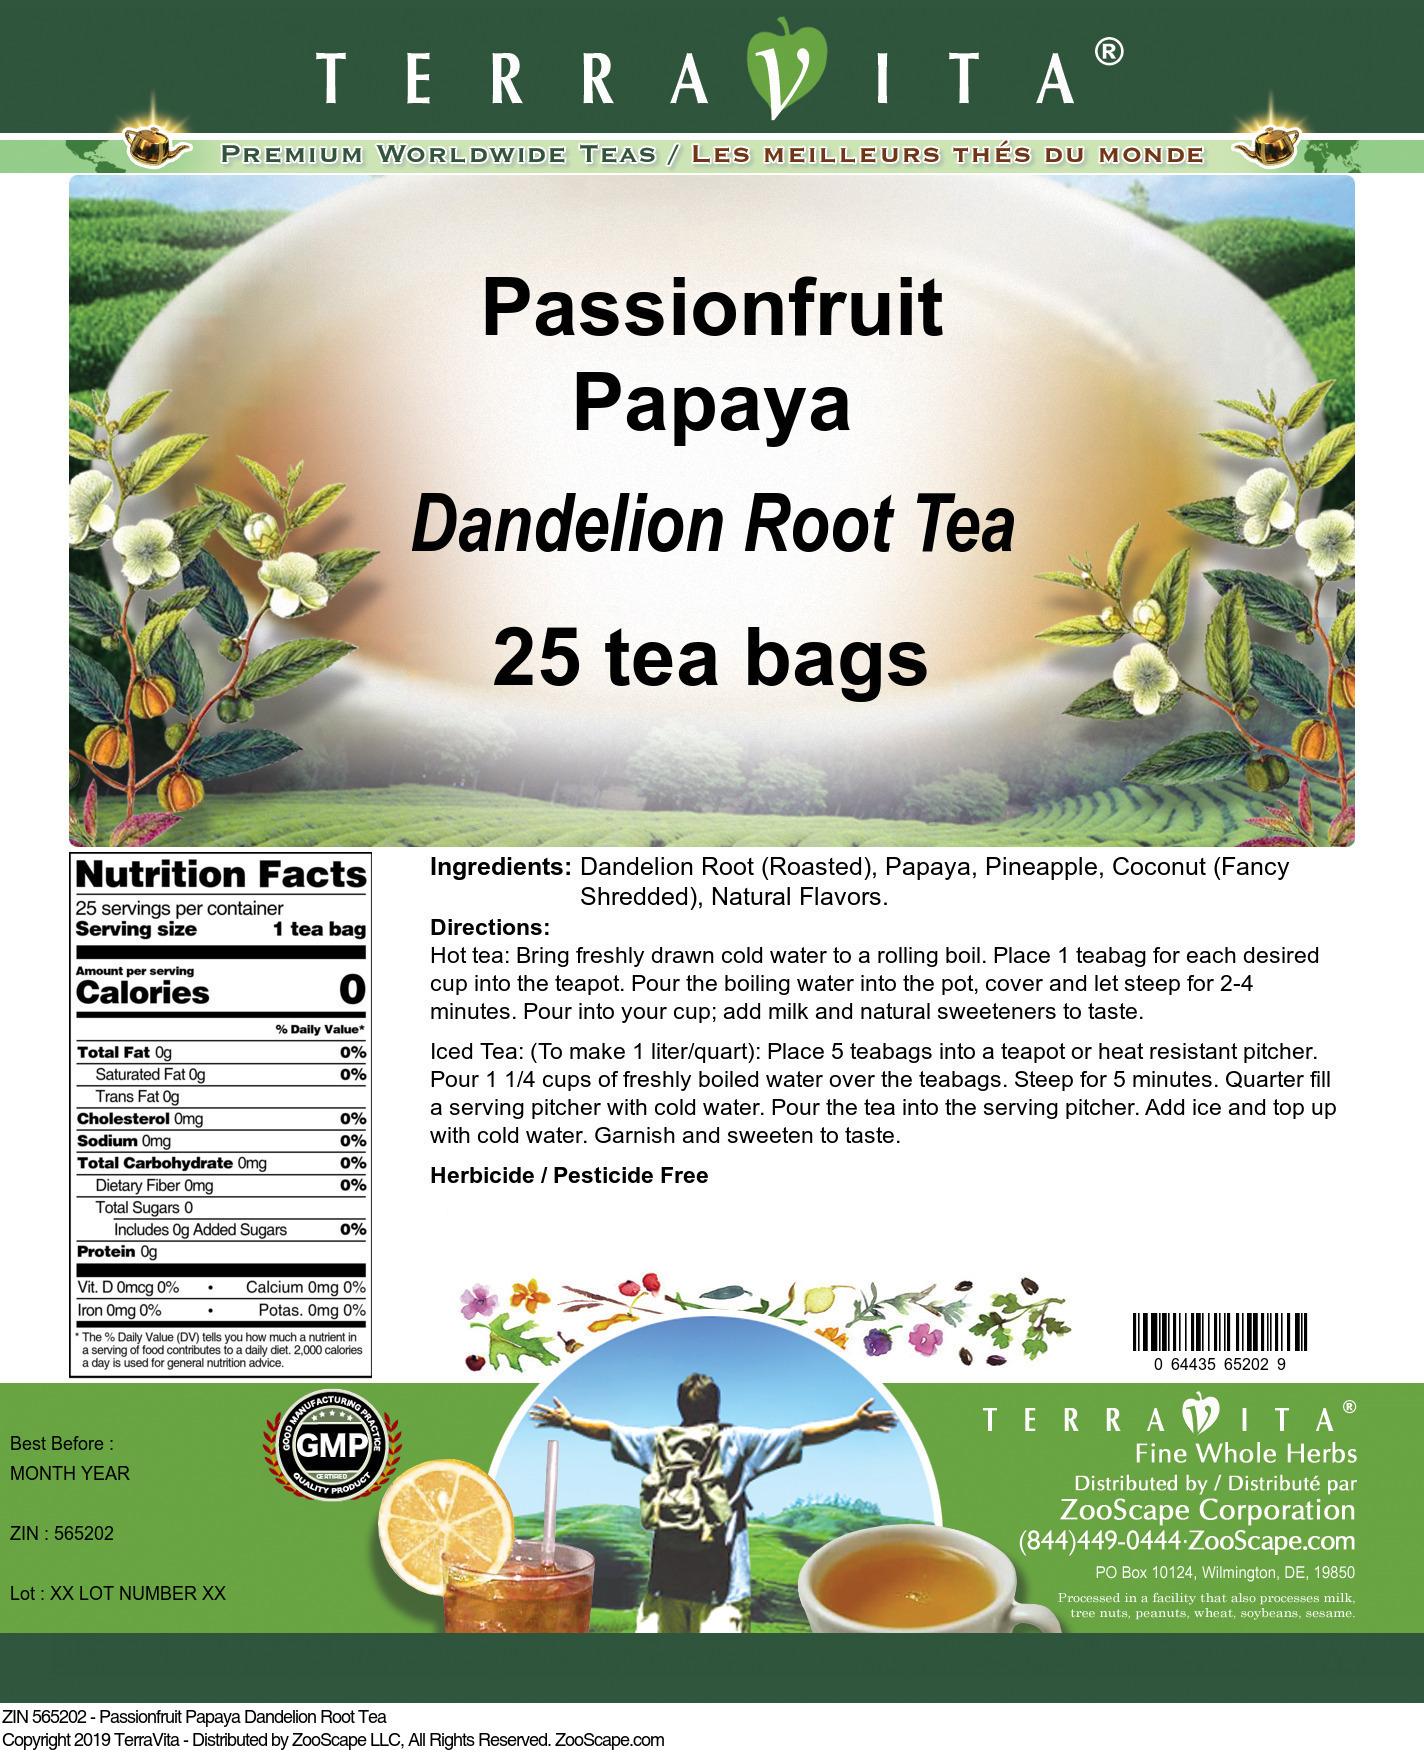 Passionfruit Papaya Dandelion Root Tea